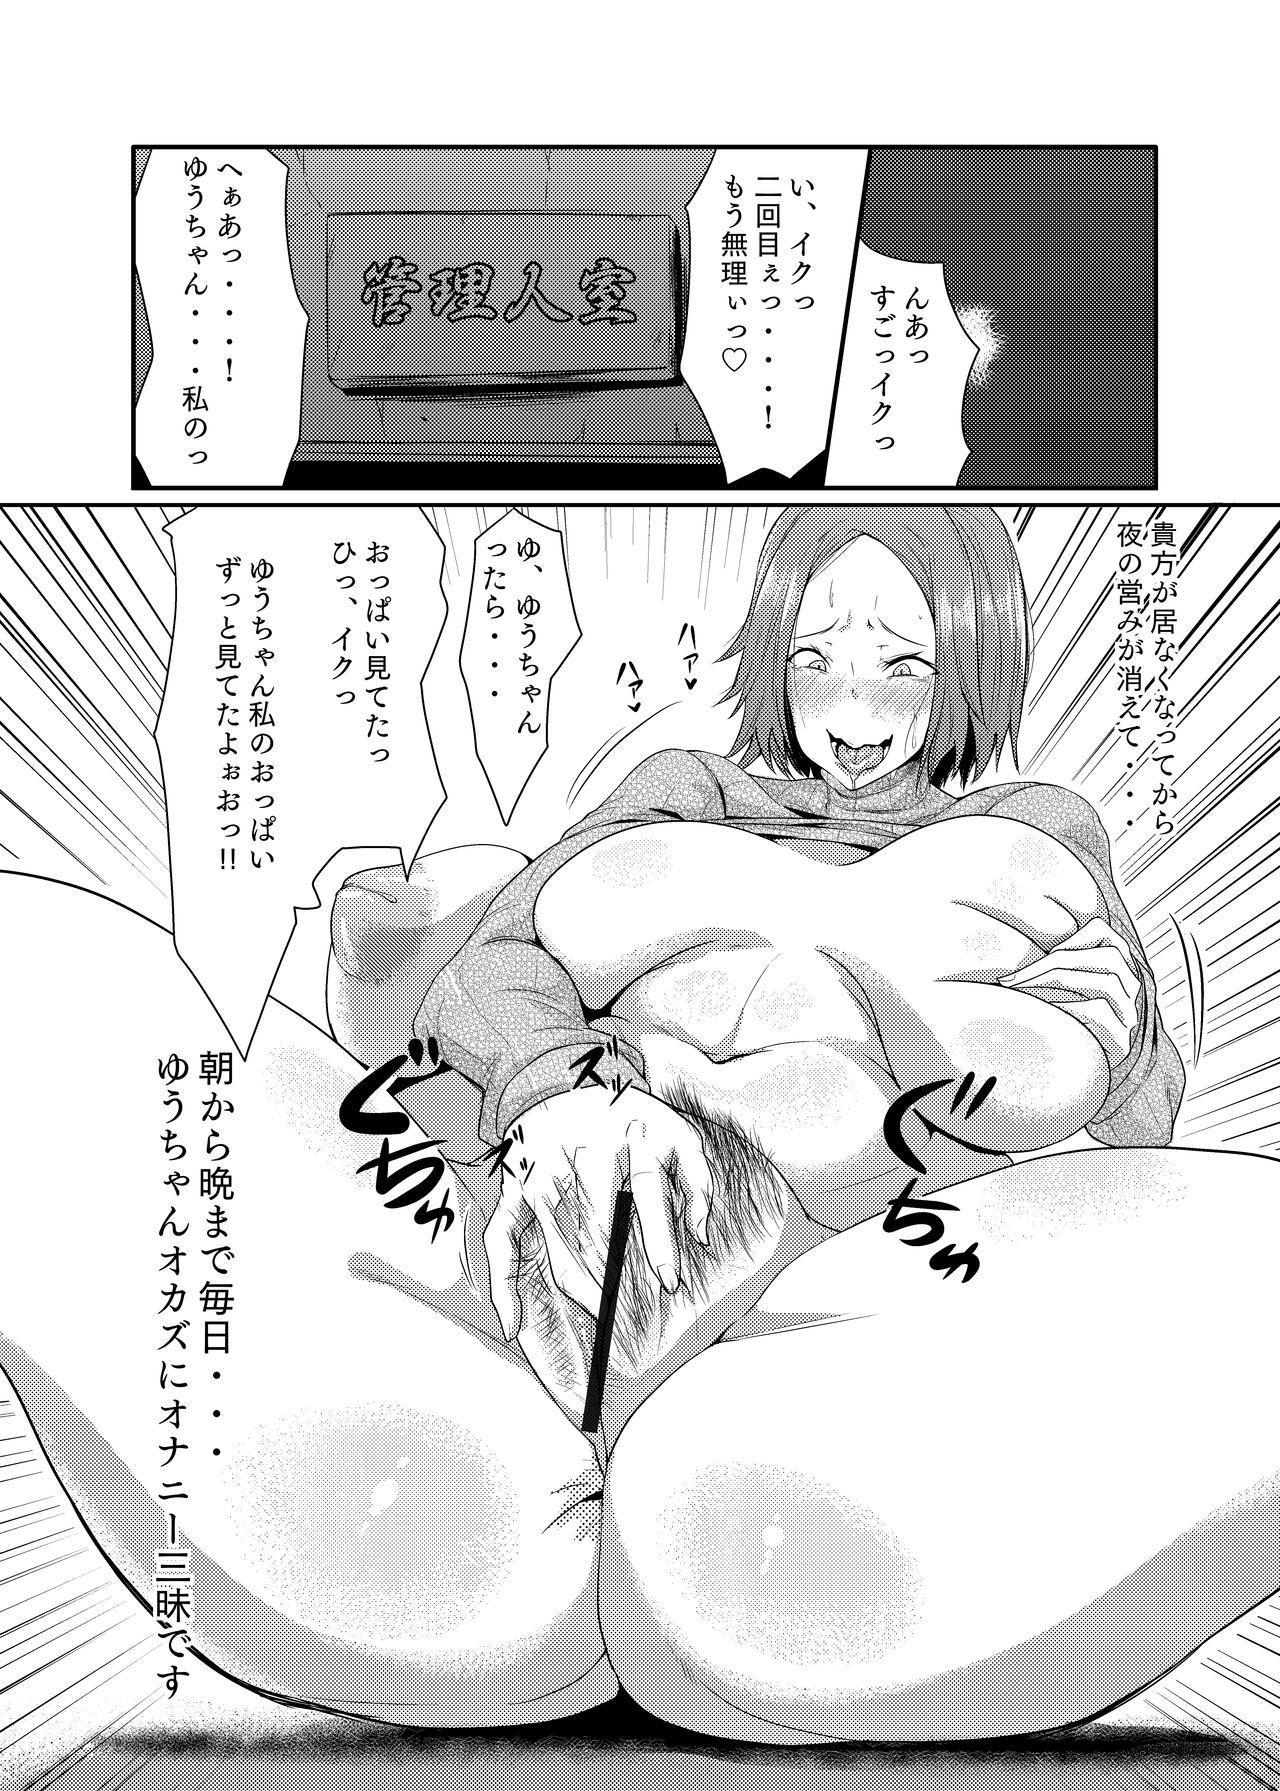 Kanrinin-san wa Mirareta!! 5